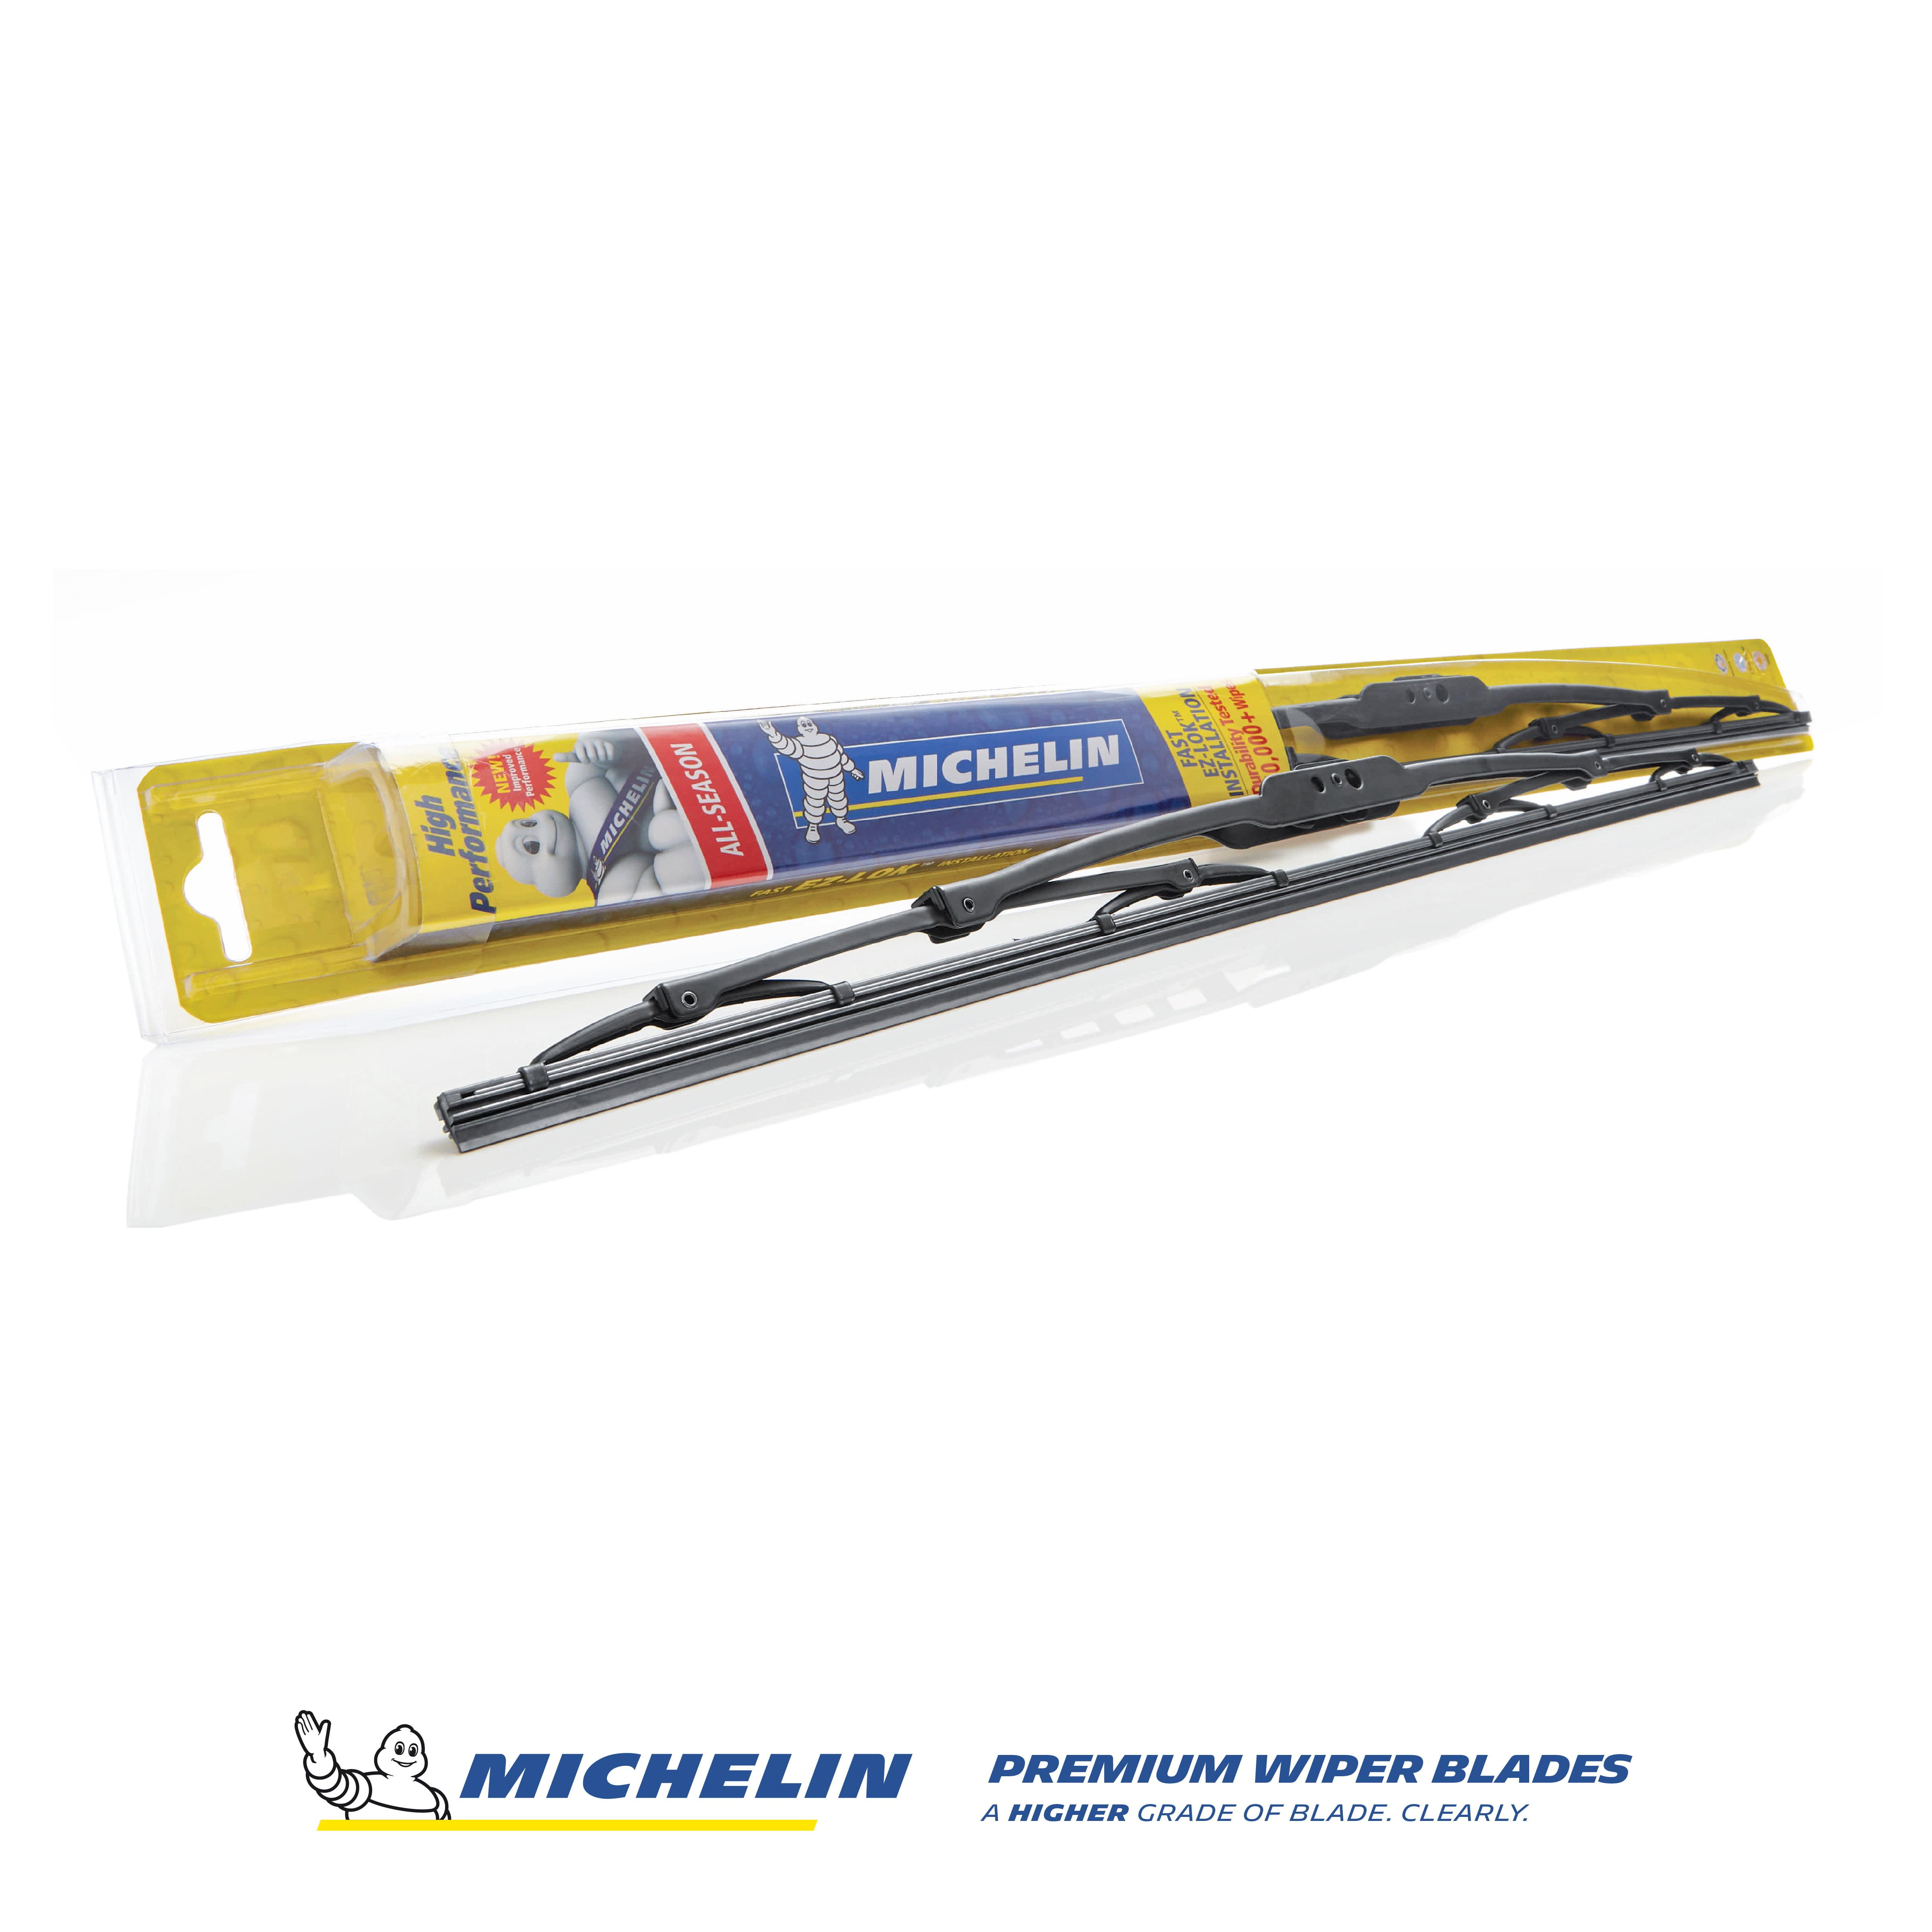 San Auto Windshield Wiper Blade Replacement 26+16 U Shape Universal Fit All-Season Front Rear Car Rain Wipers Windscreen 2 Packs